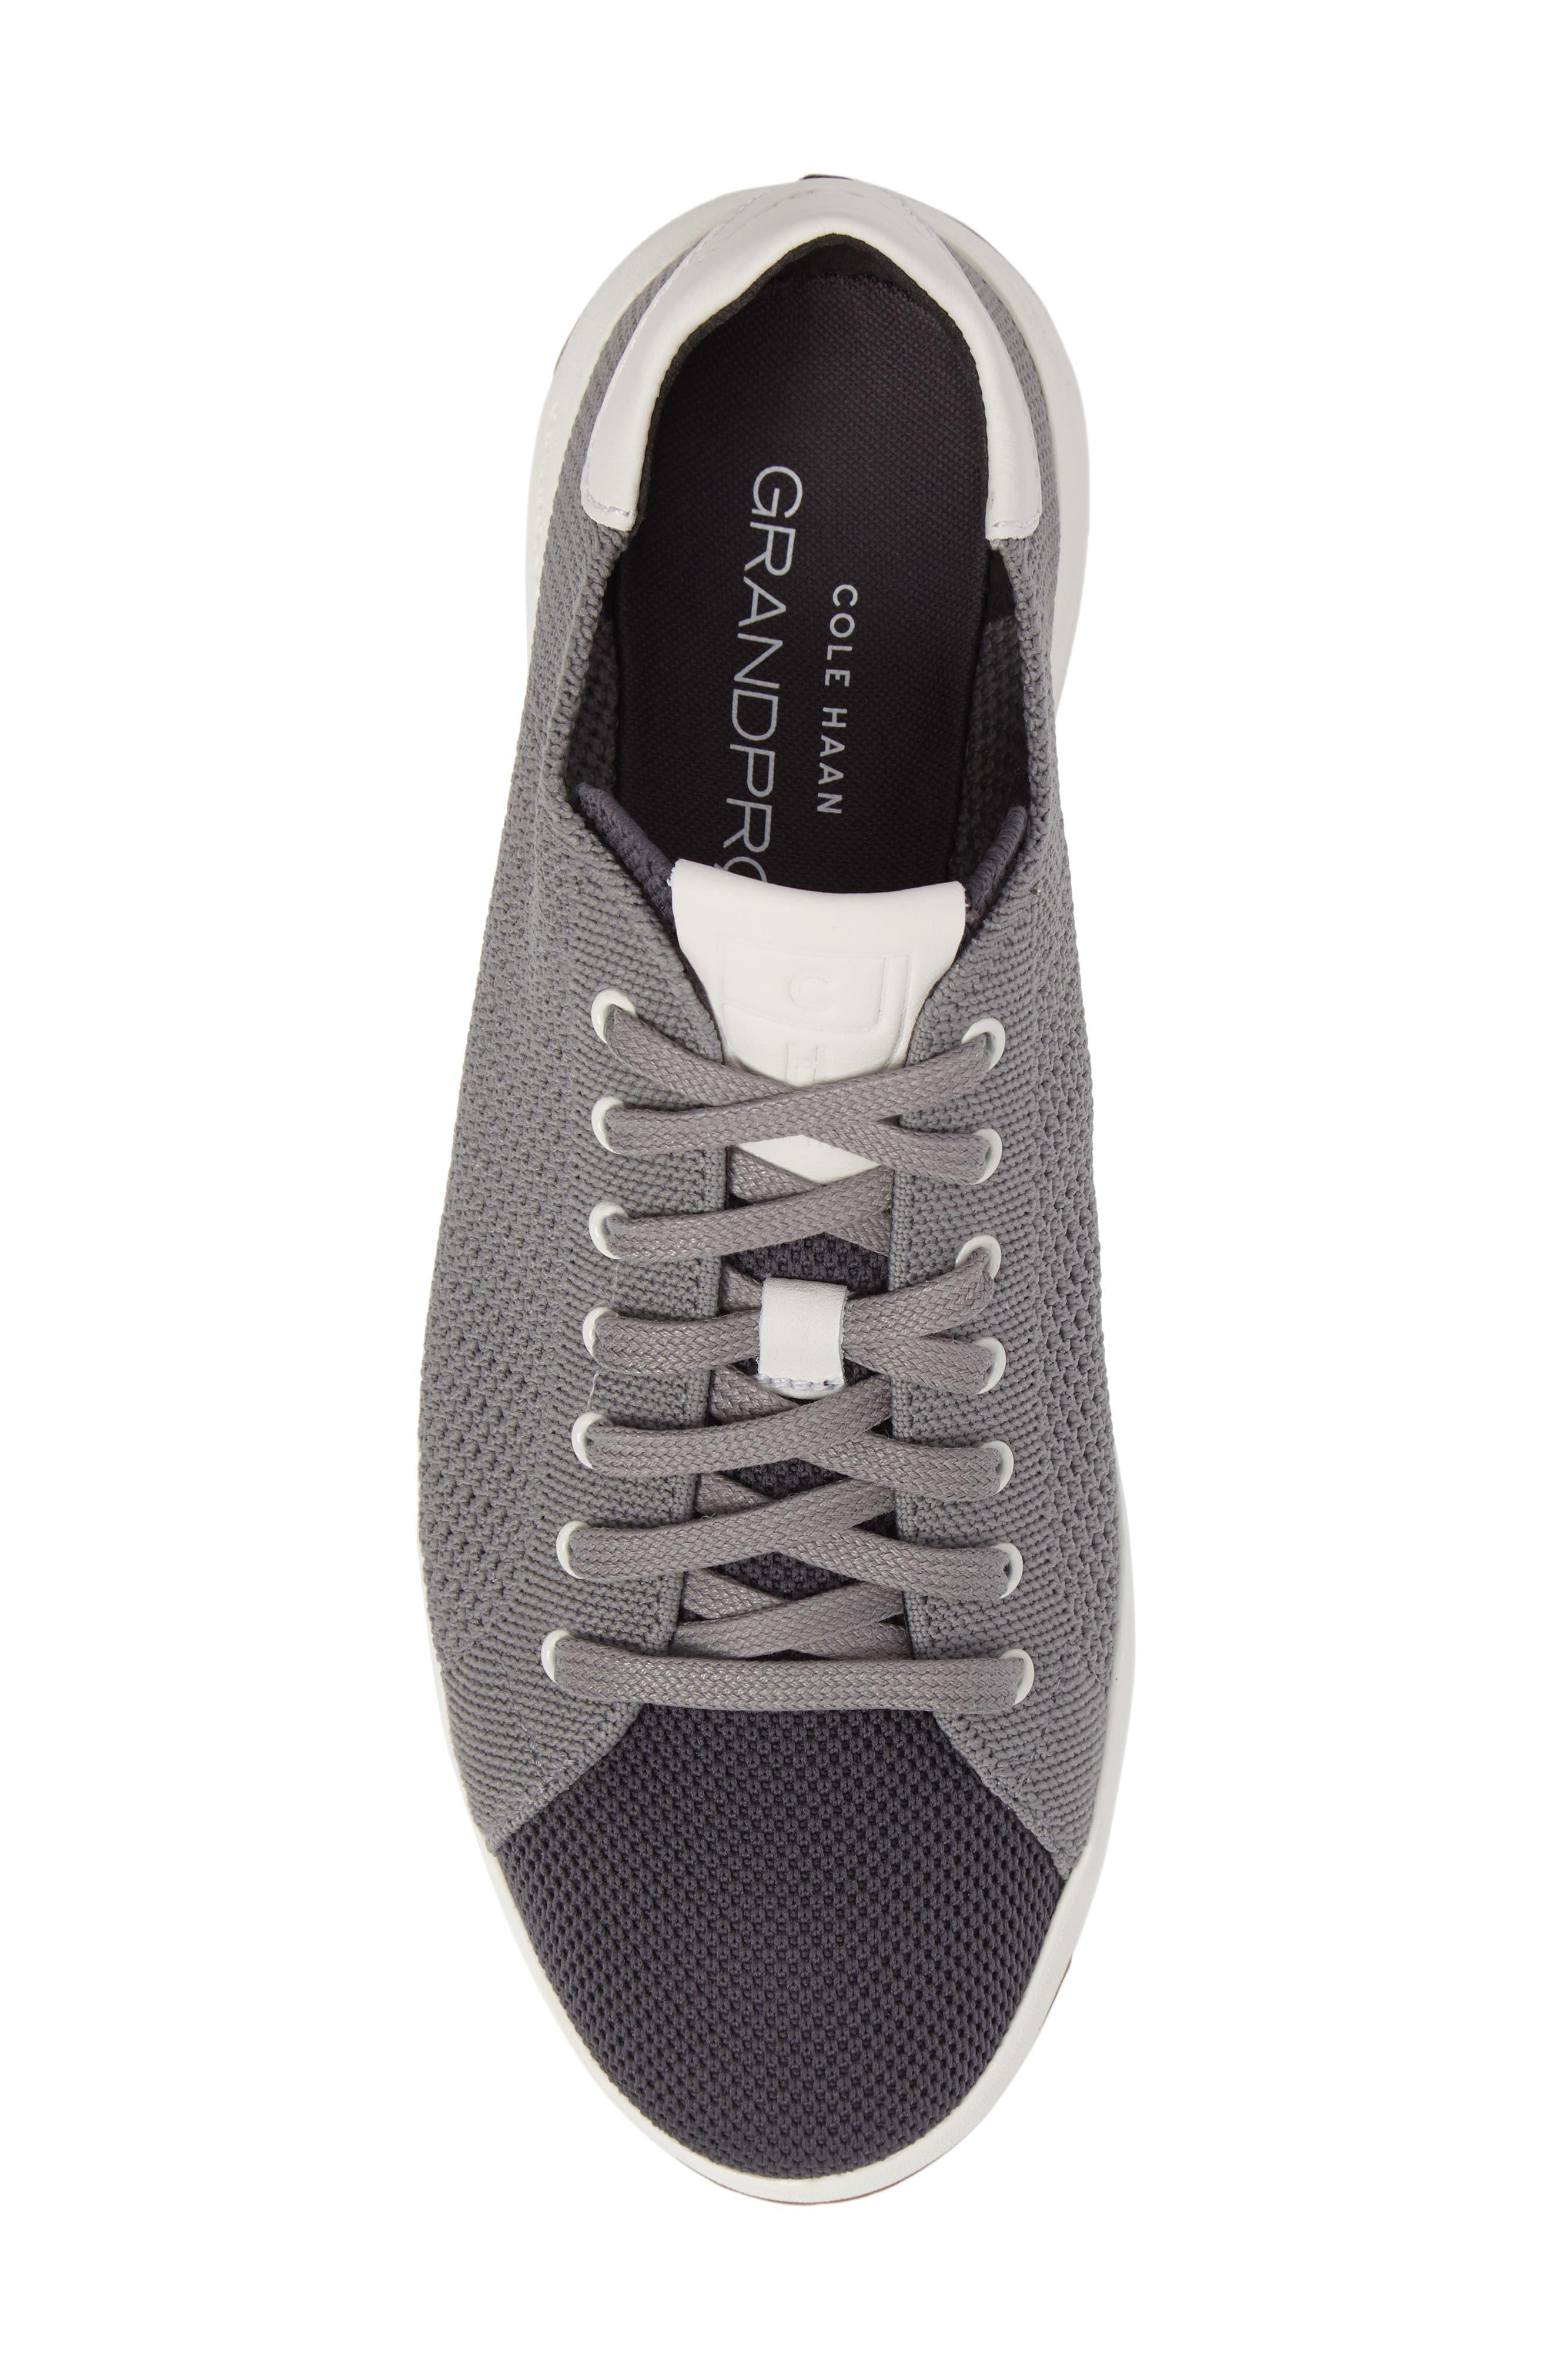 GrandPrø Stitchlite Tennis Sneaker,                             Alternate thumbnail 5, color,                             Magnet Grey Fabric